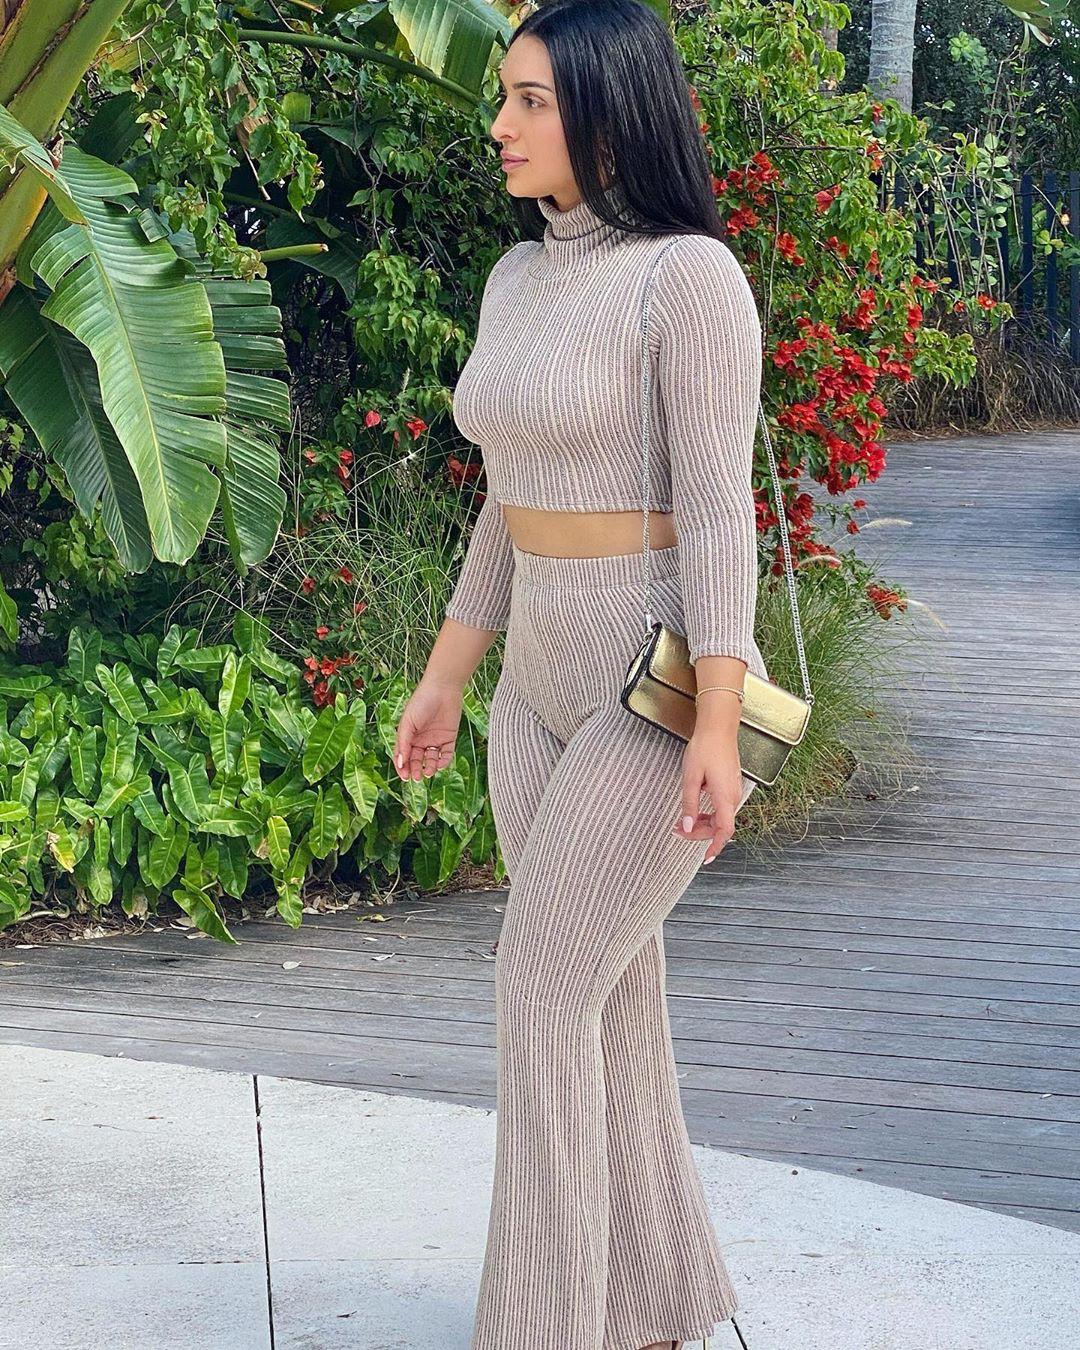 Nebby Fusco dress crop top, top dress for girls